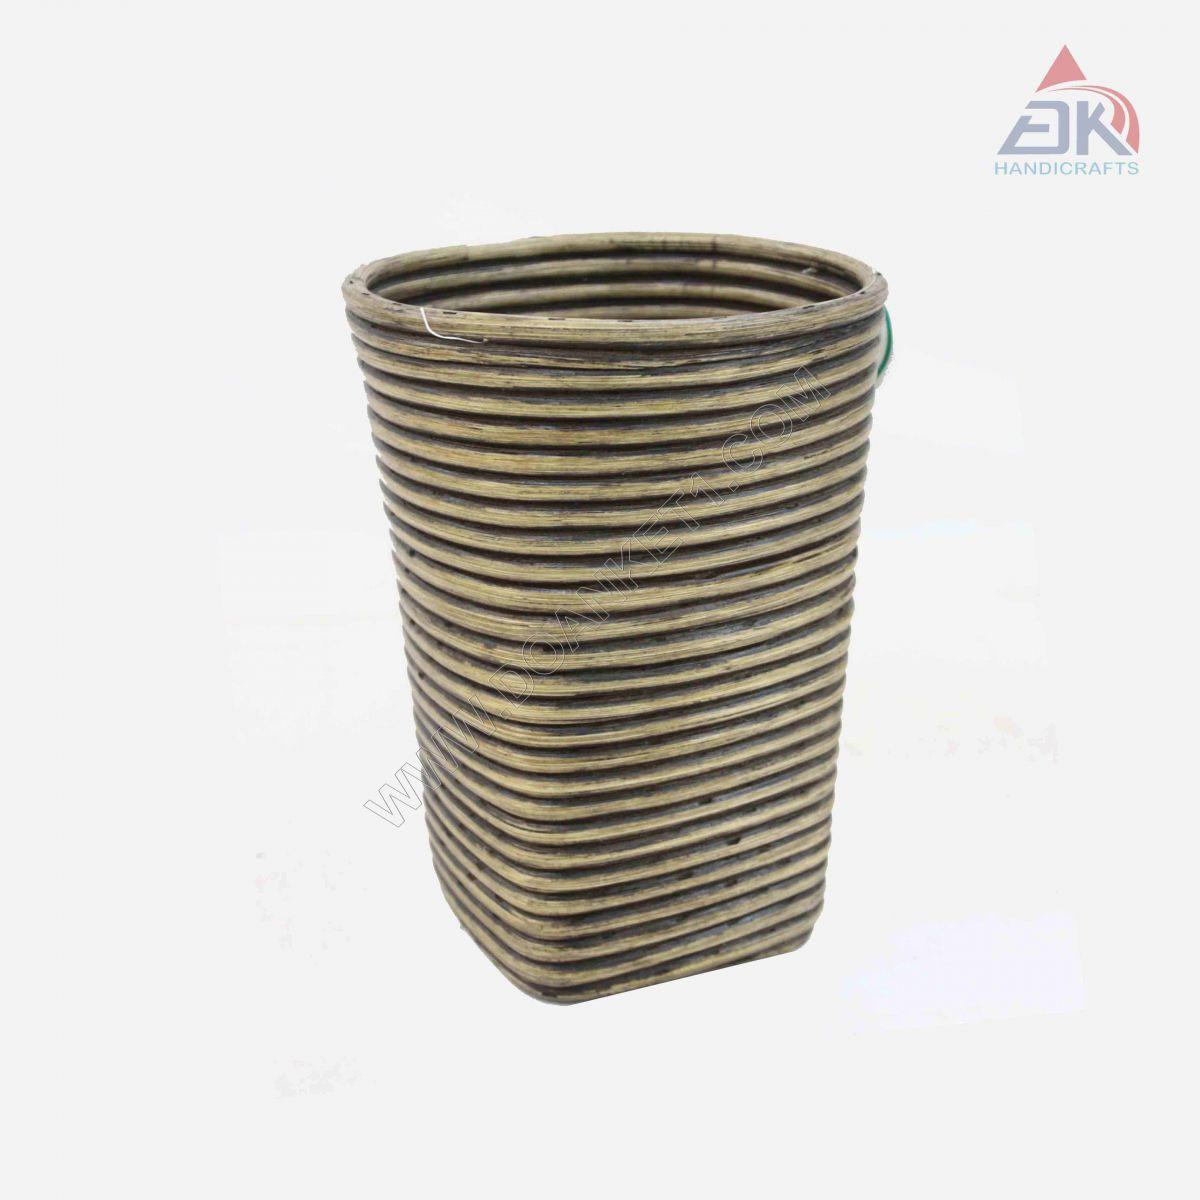 Rattan Coiled Basket # DK39